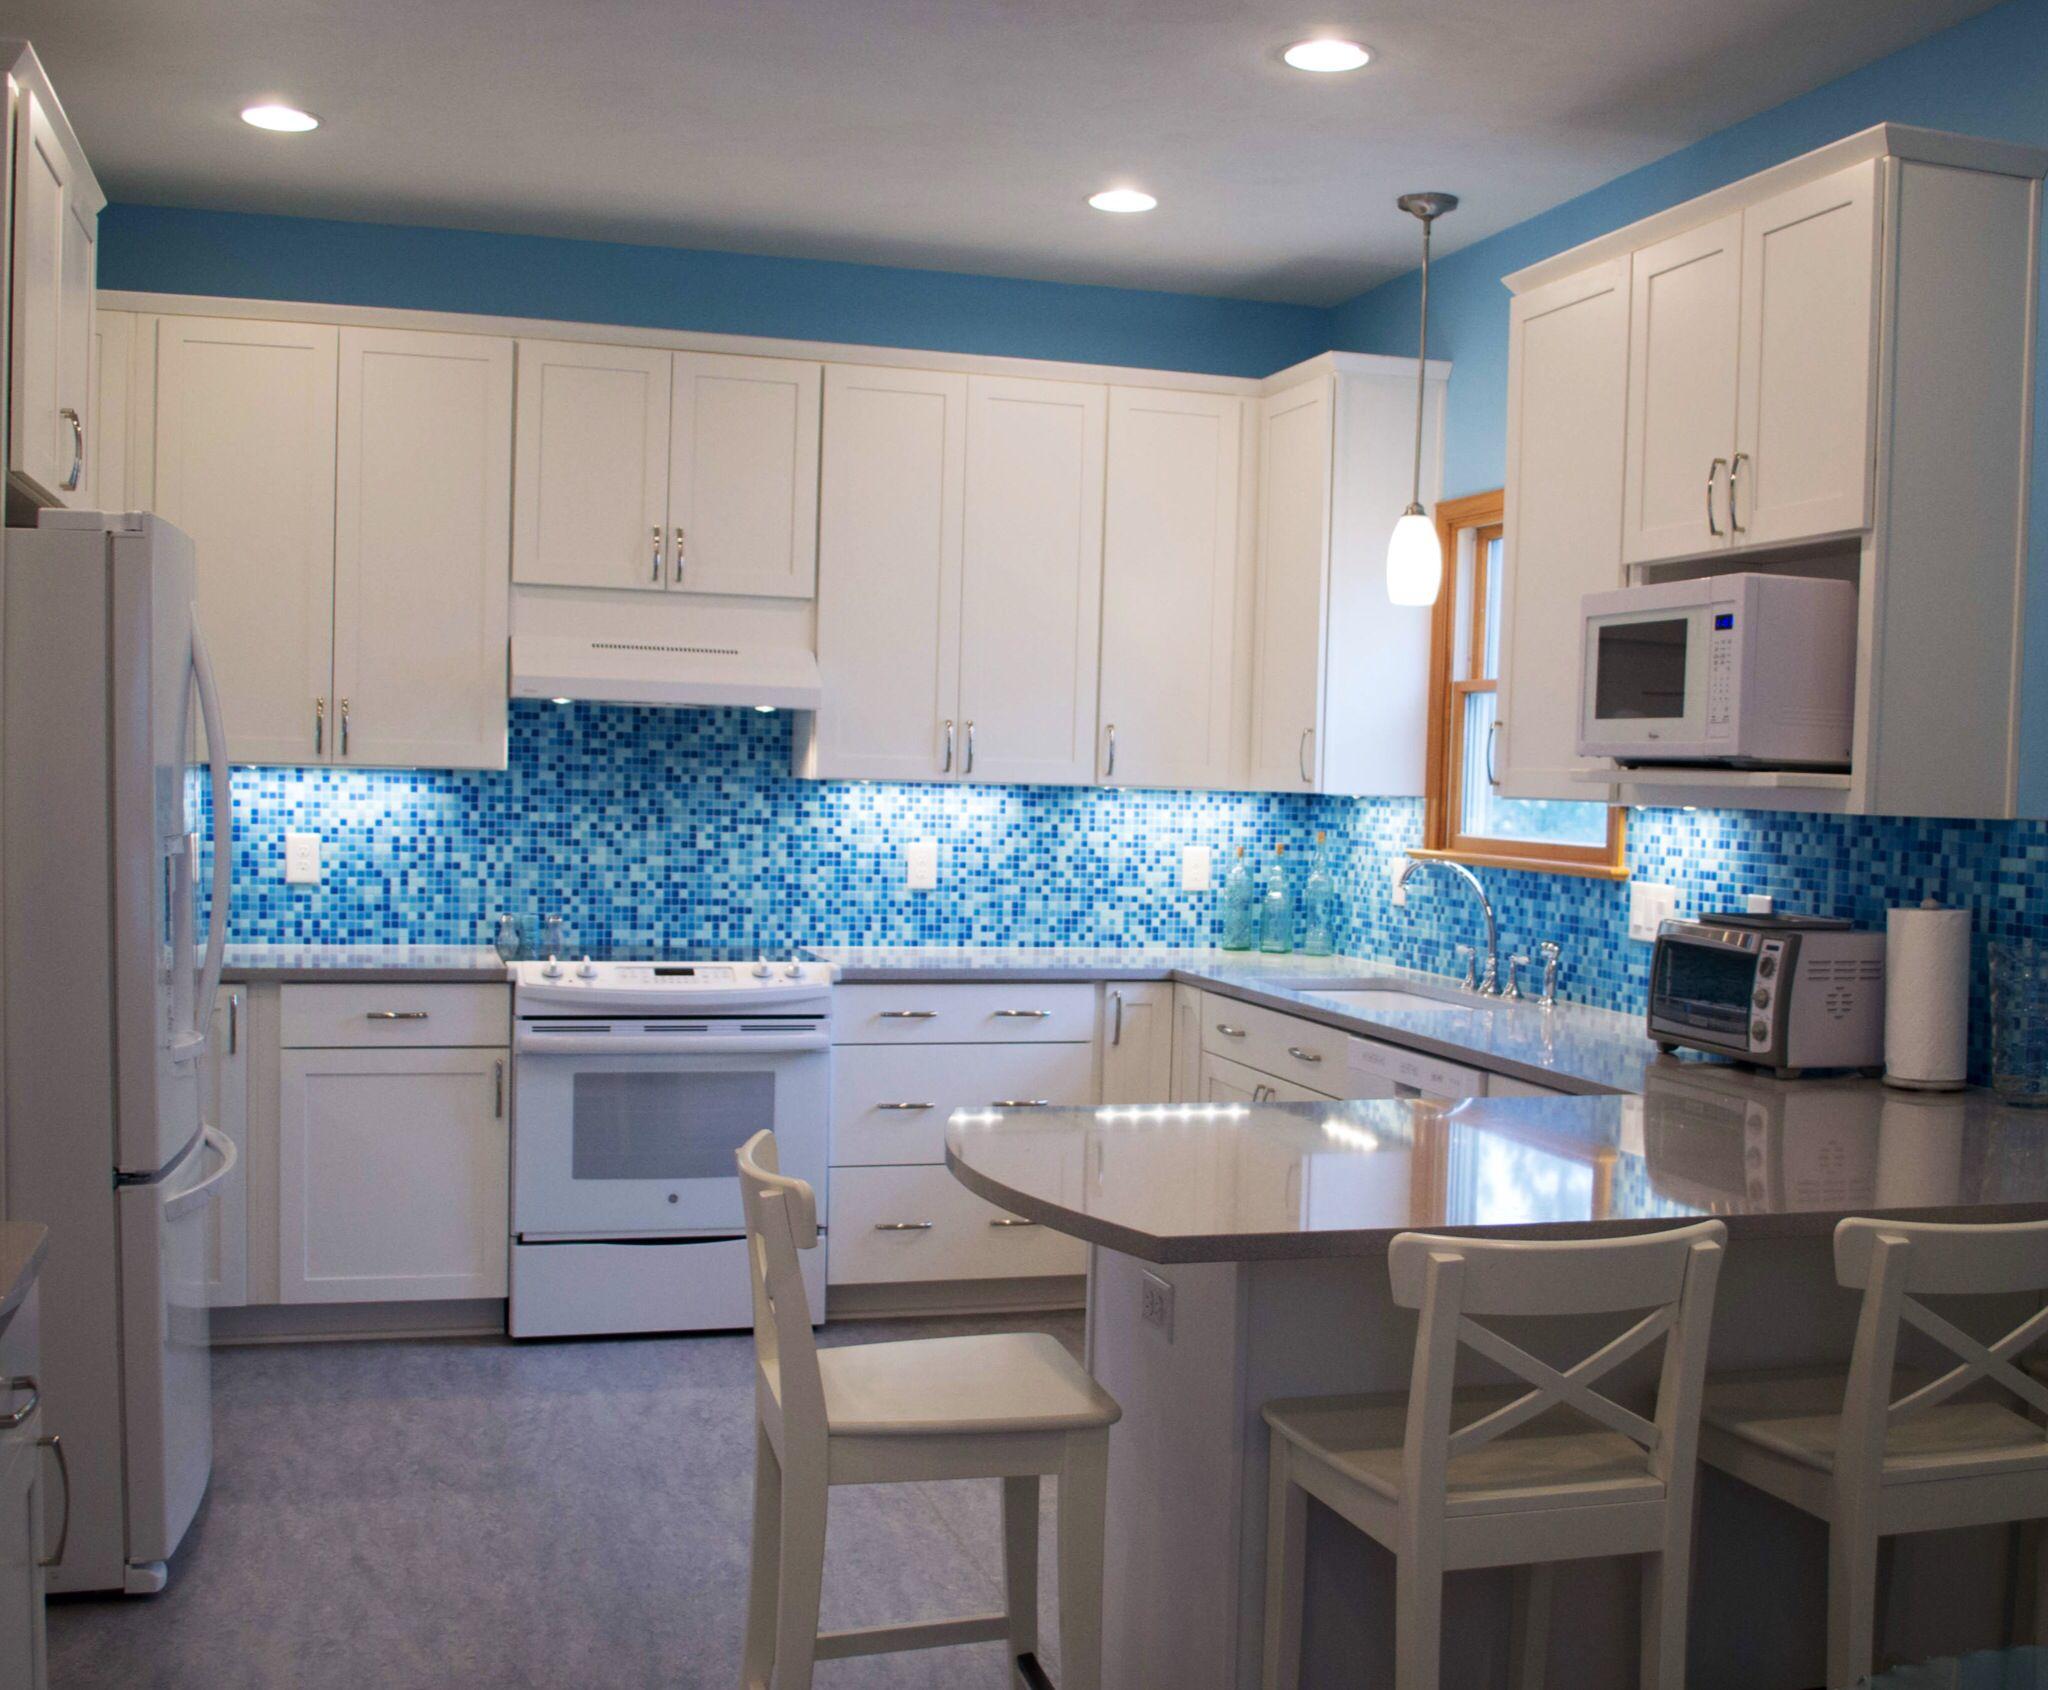 Brio glass mosaic tile kitchen backsplash. Cool Pool blend In stock ...